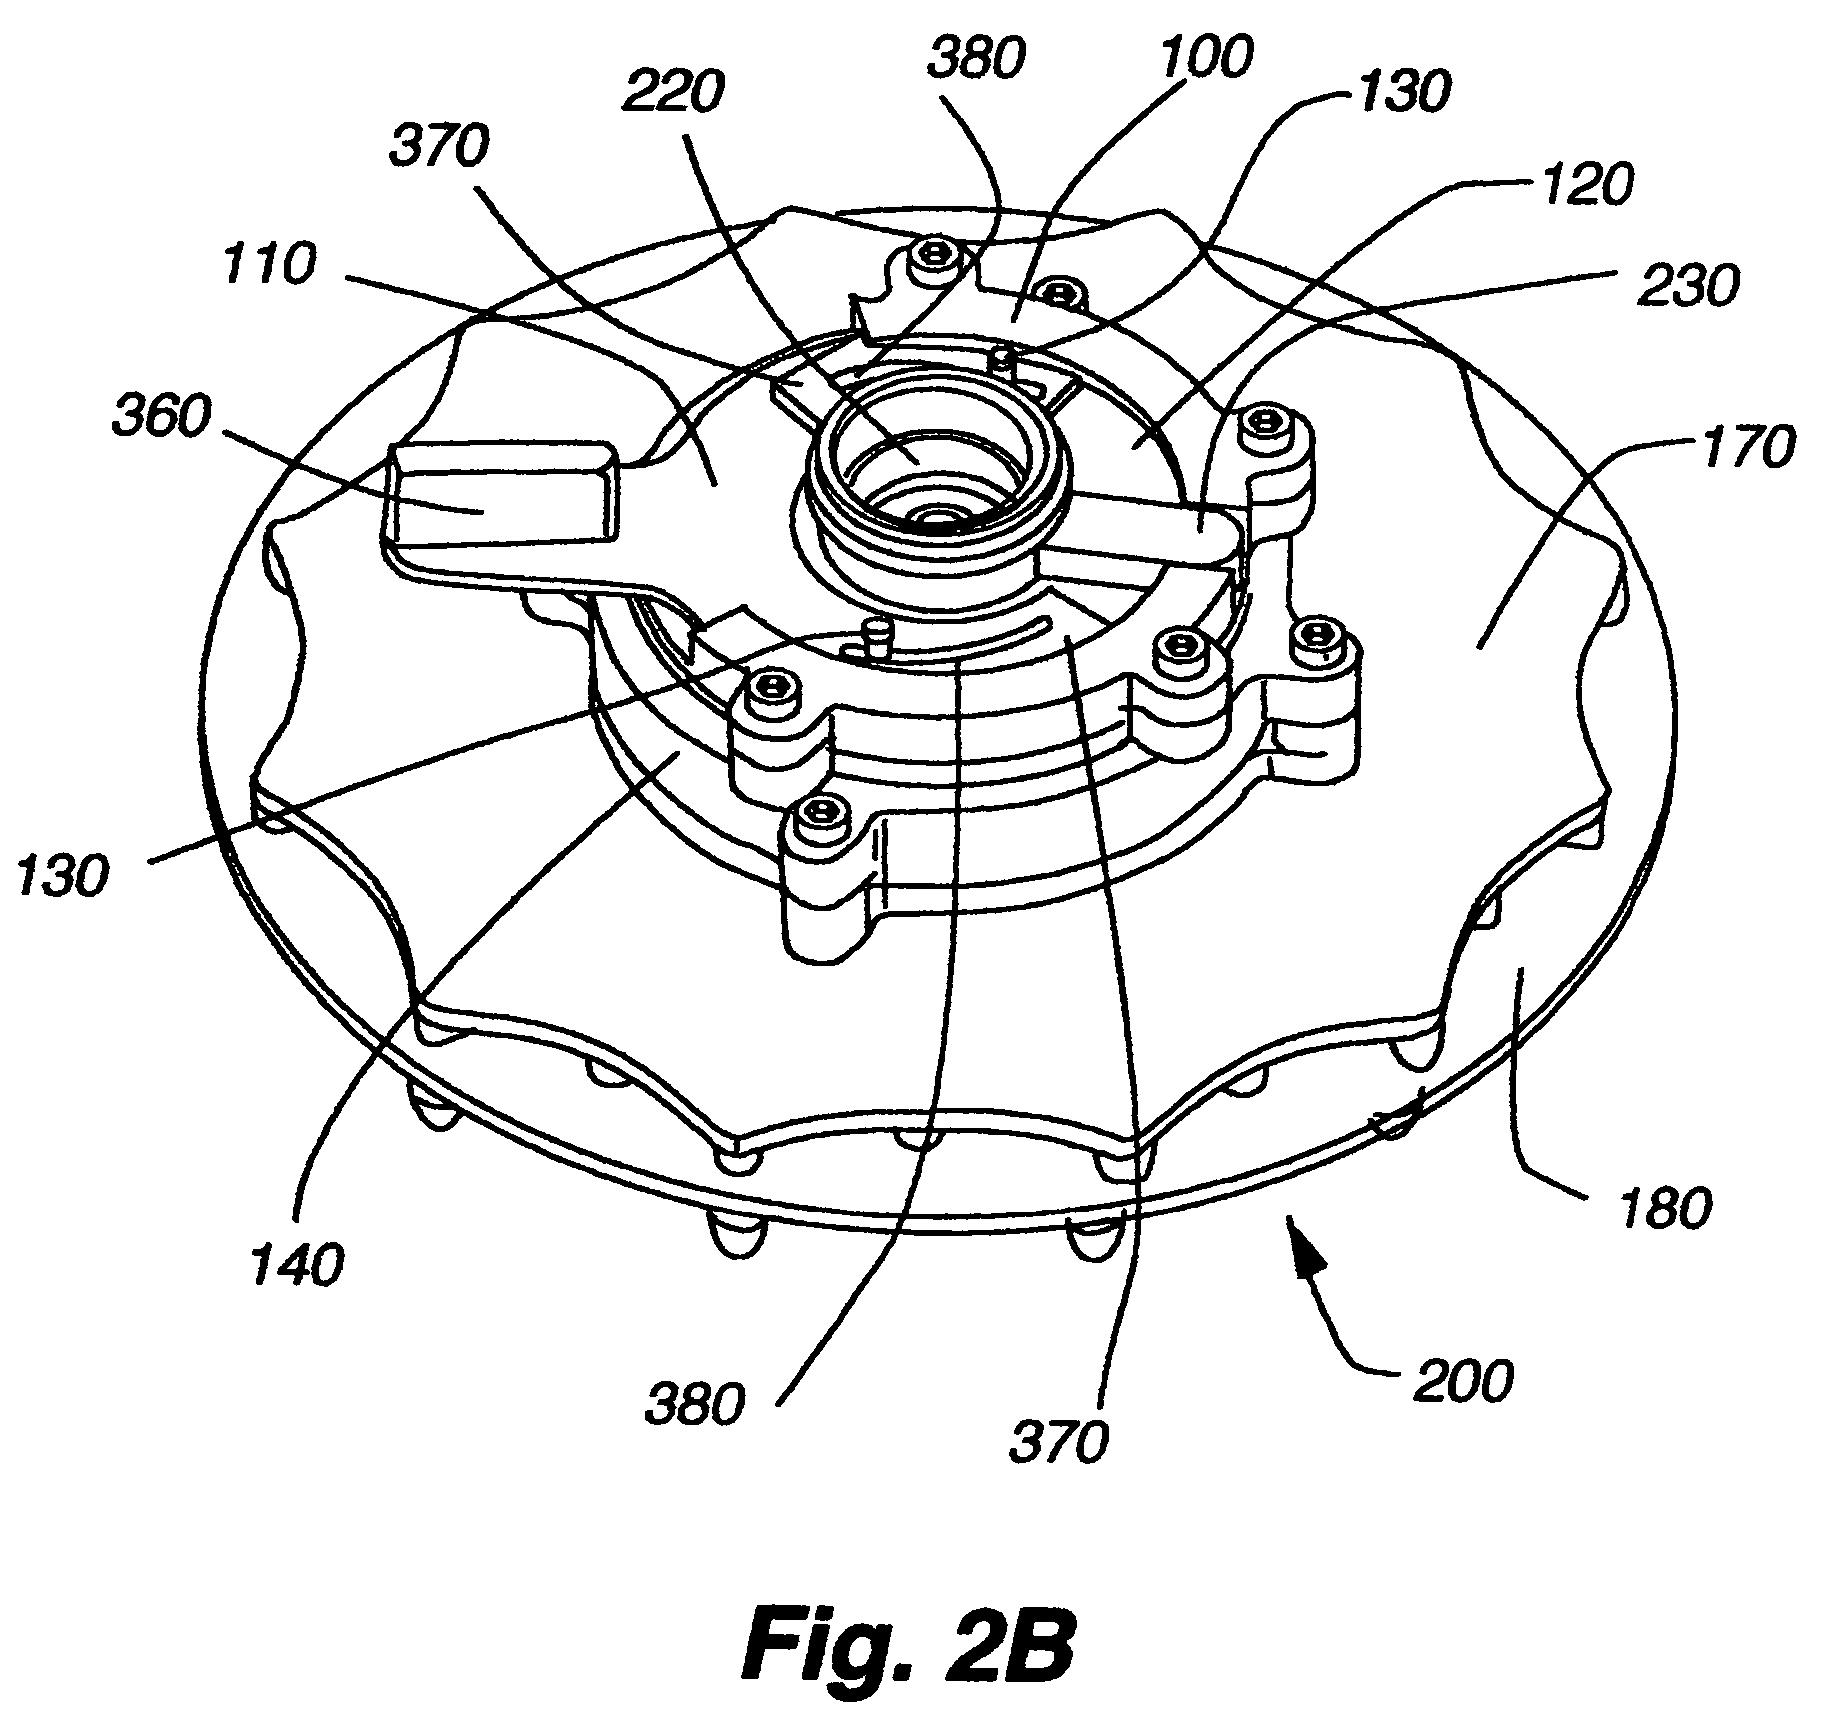 patent us7740186 drenching shower head patents 1952 Henry J Custom patent drawing